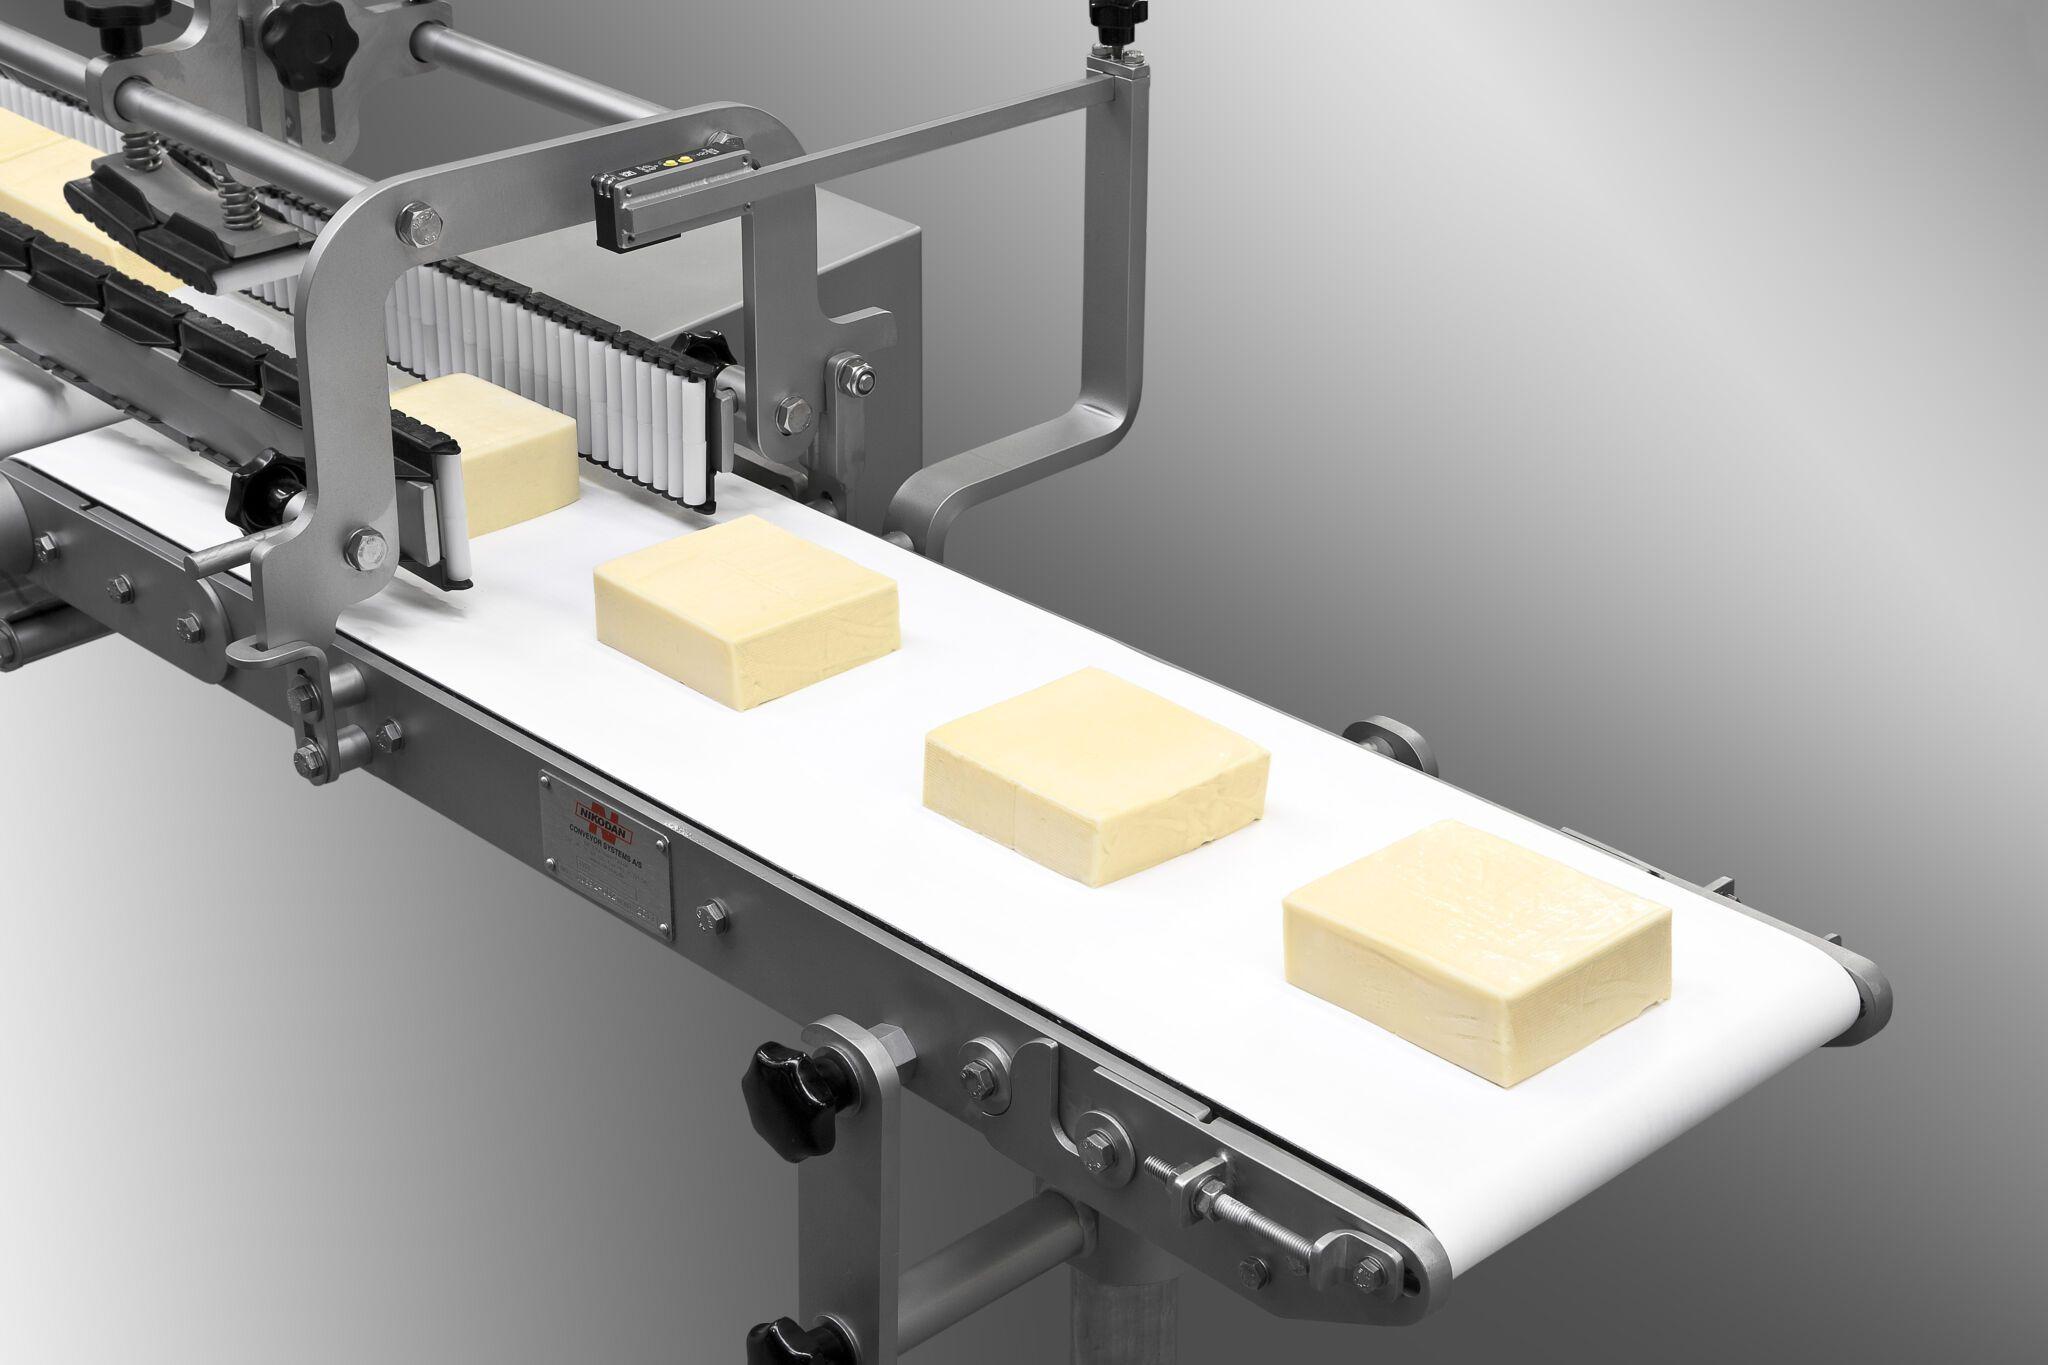 Infeeder blocks of cheese